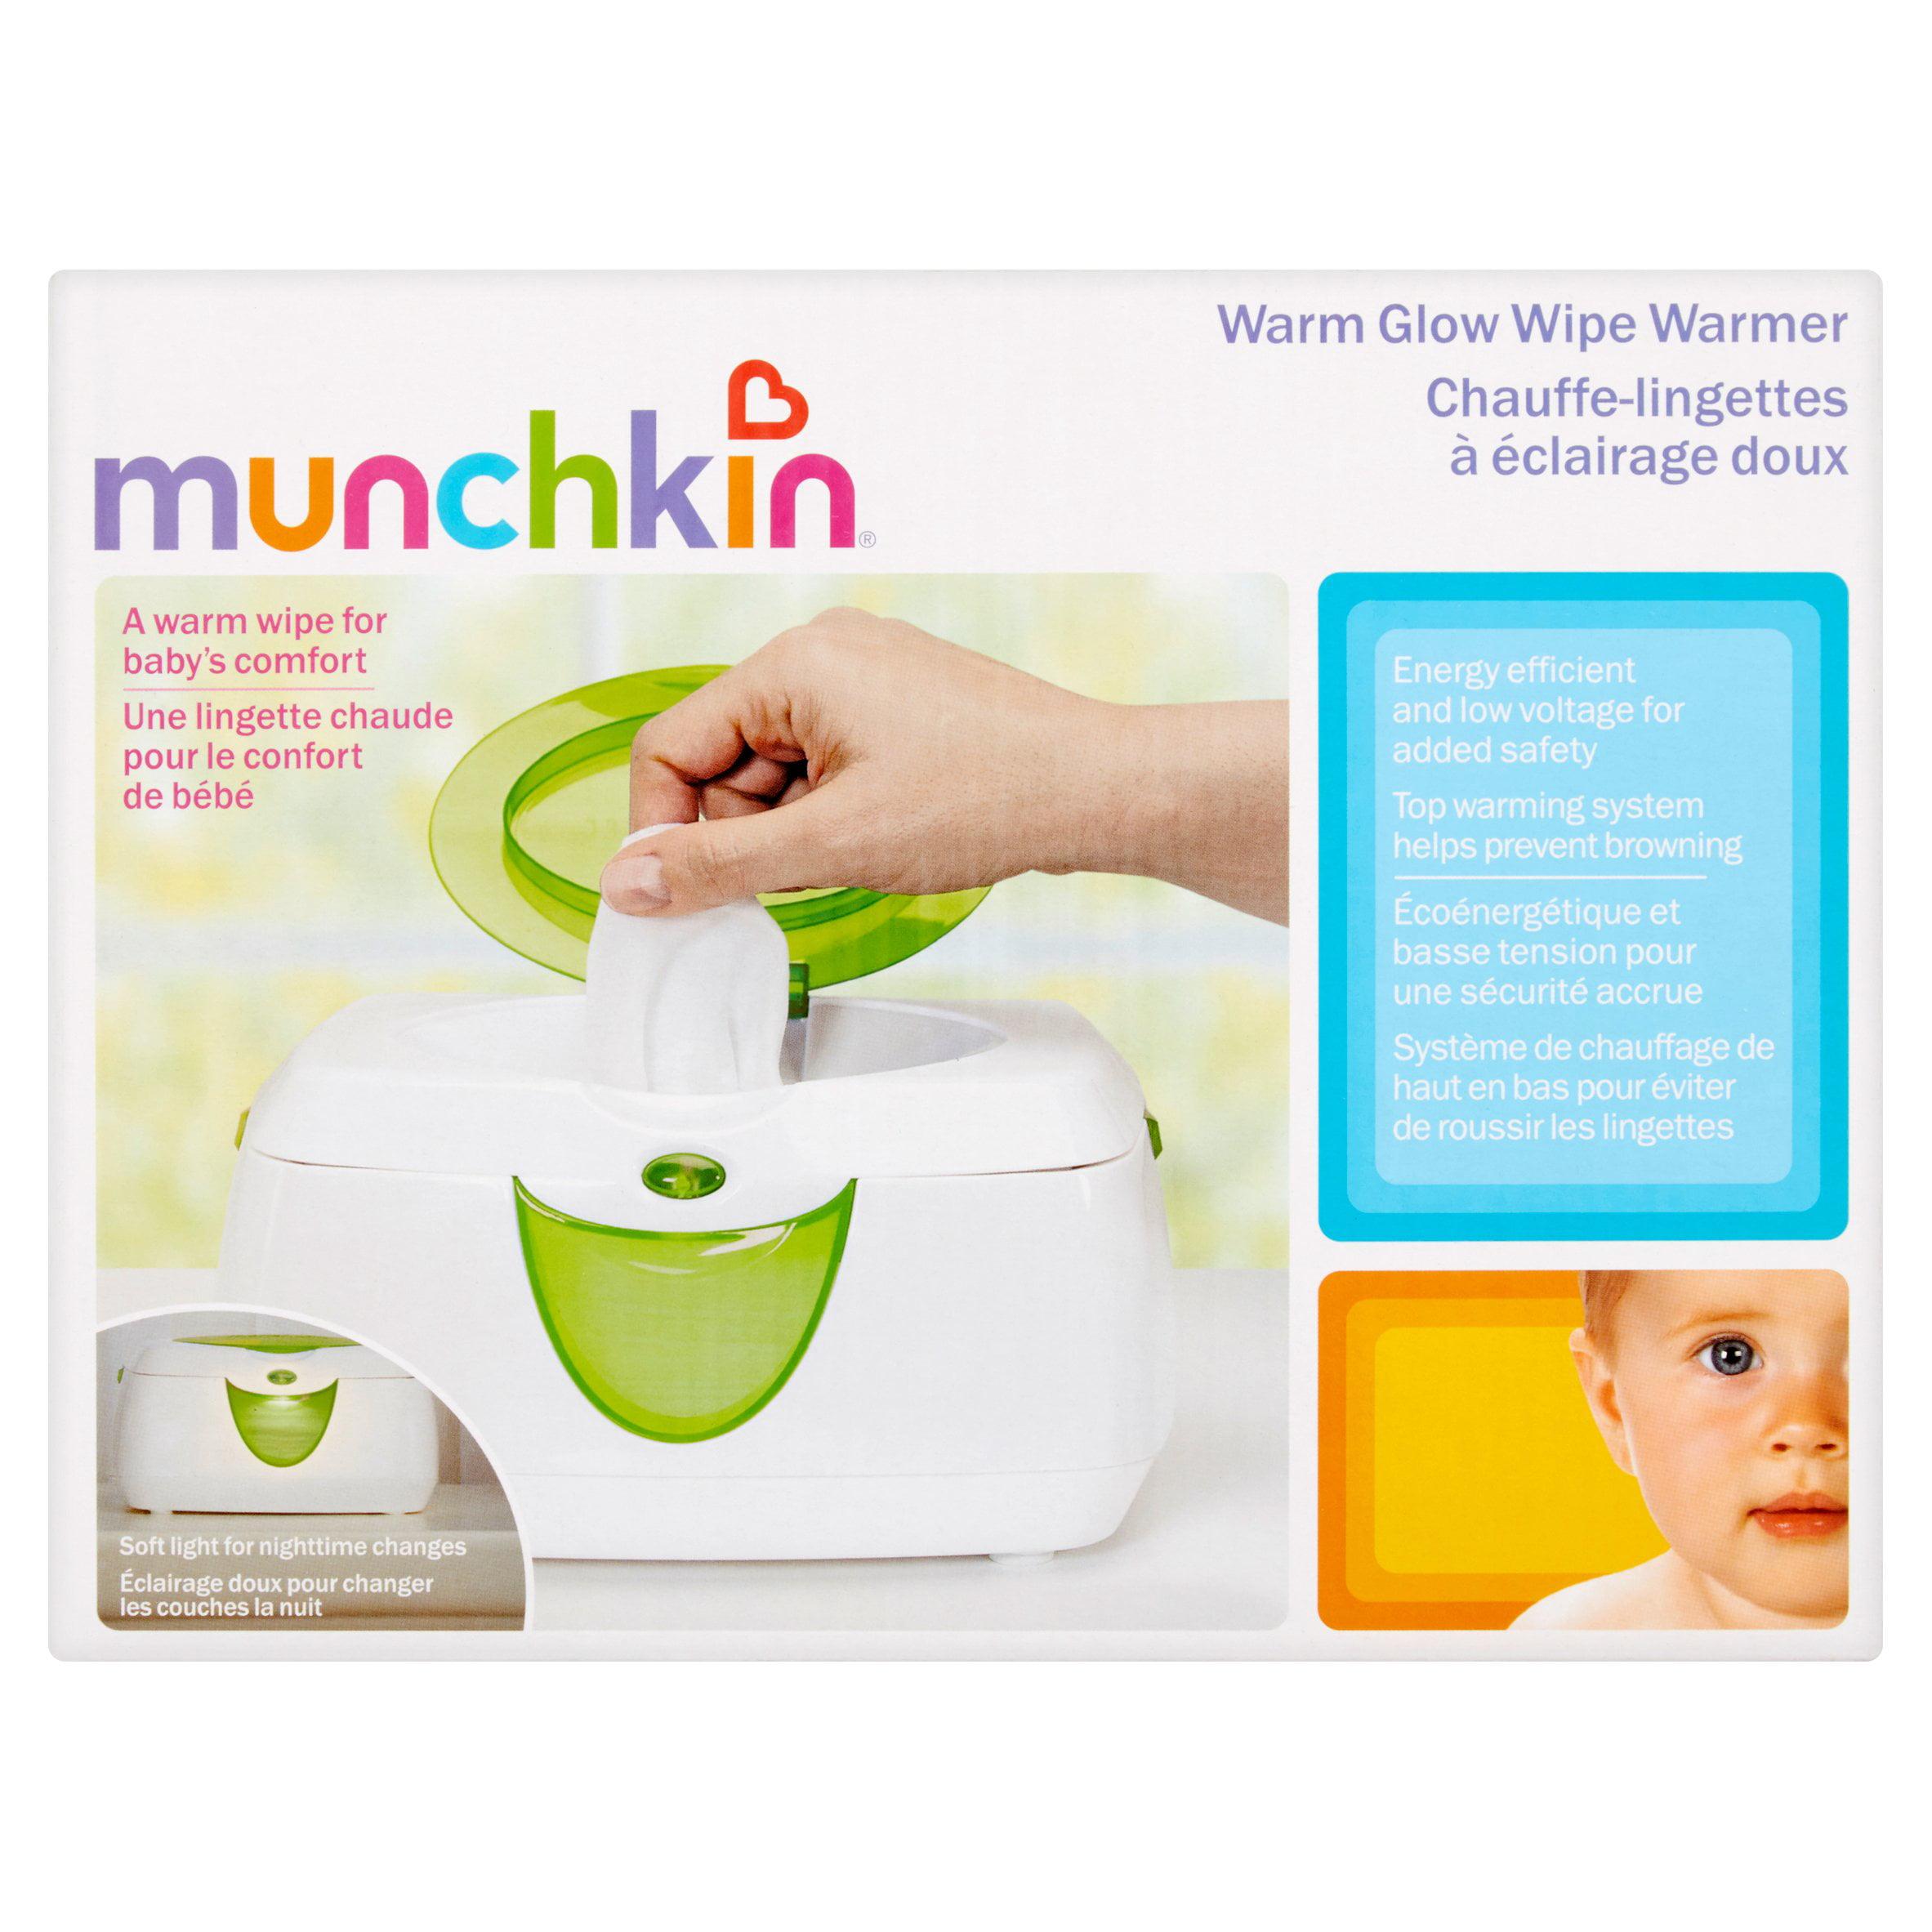 commercial pkwy branford ct com munchkin warm glow wipe warmer